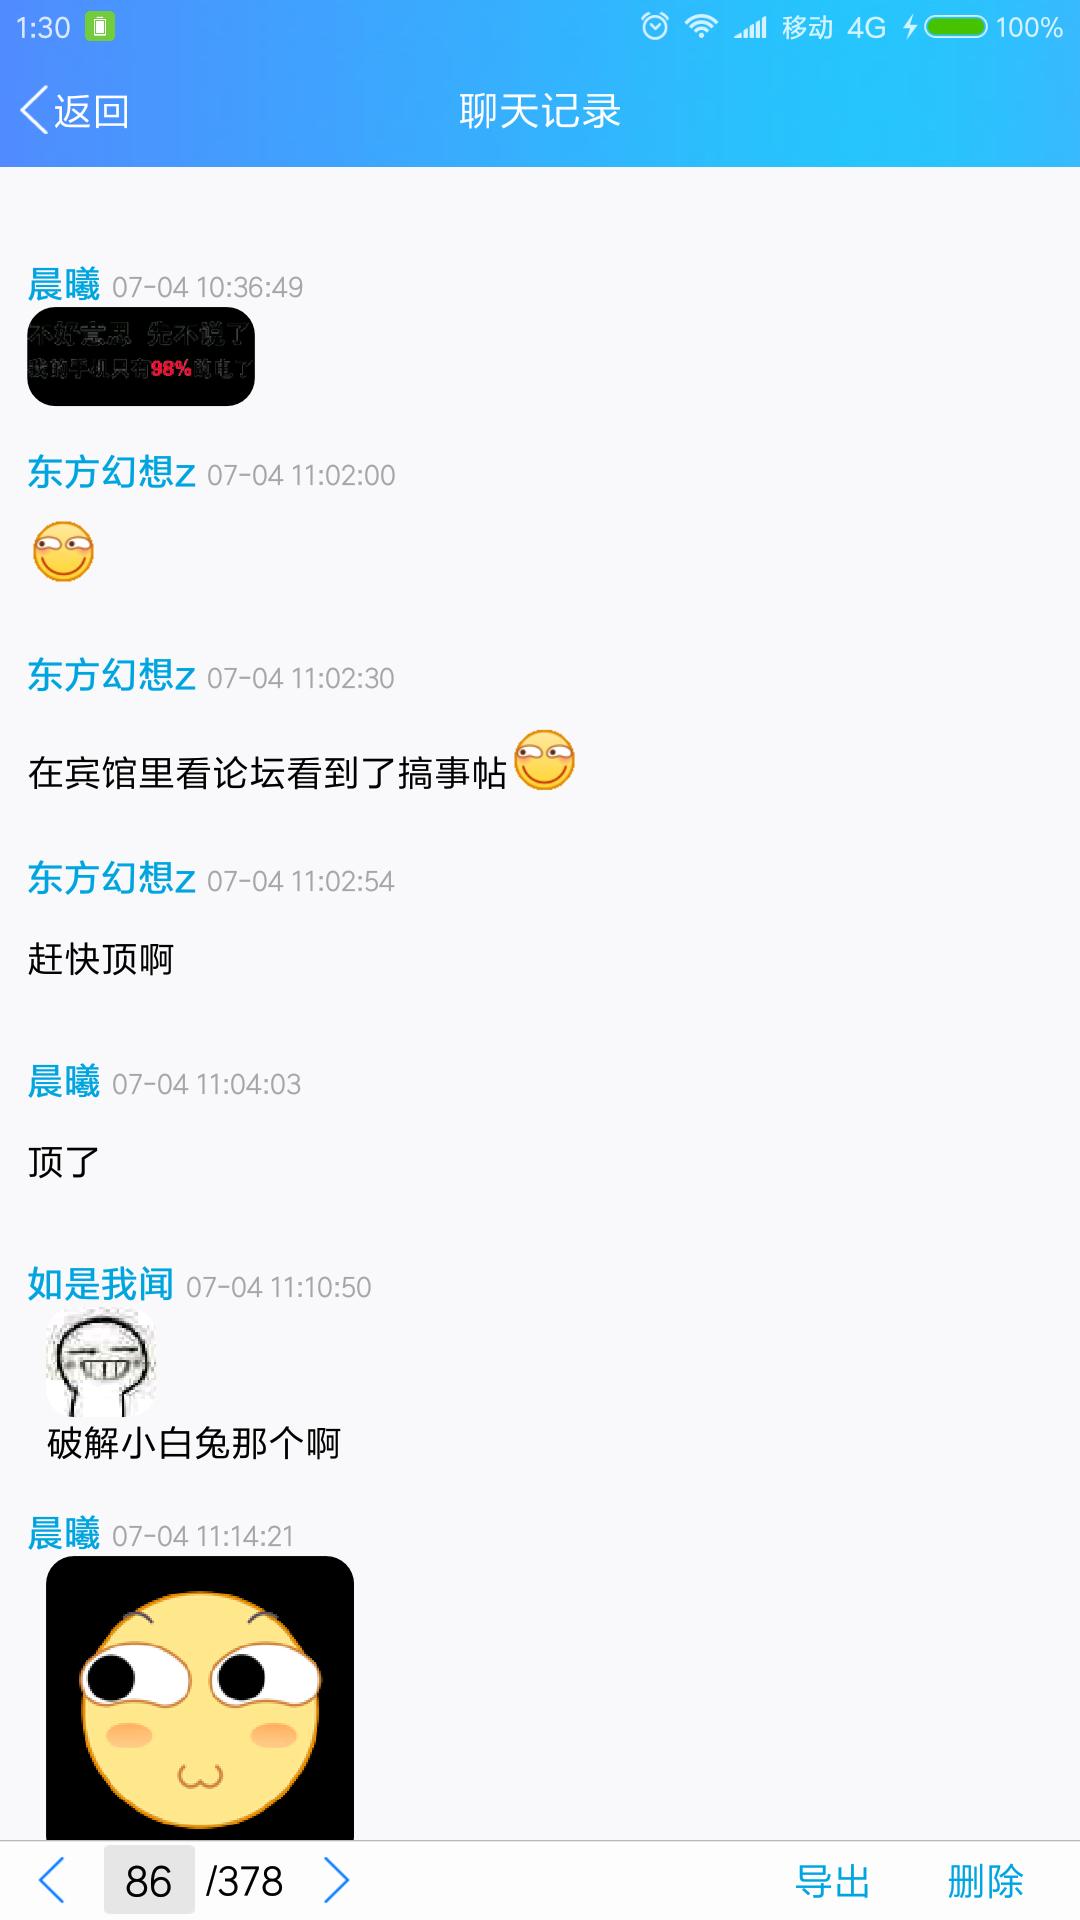 Screenshot_2017-07-09-01-30-13-545_com.tencent.mobileqq.png